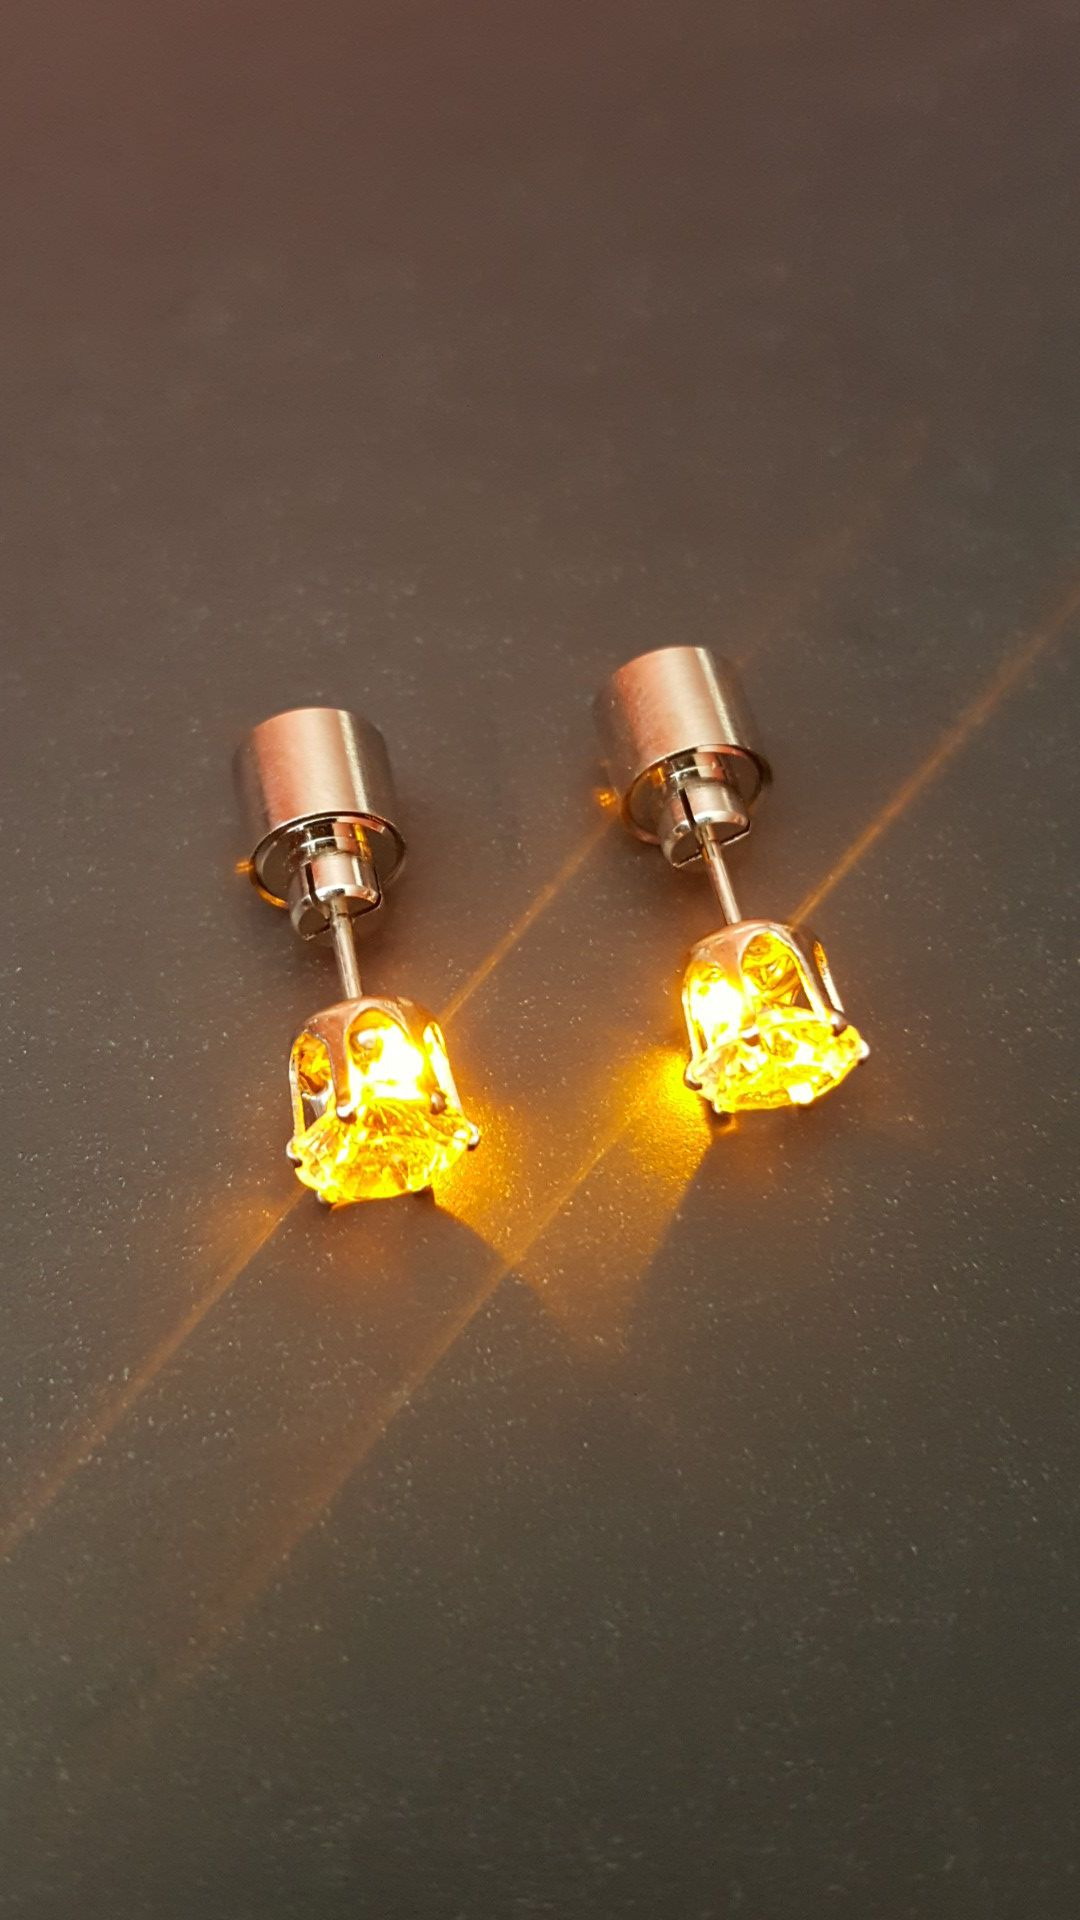 Orange LED Earring Studs